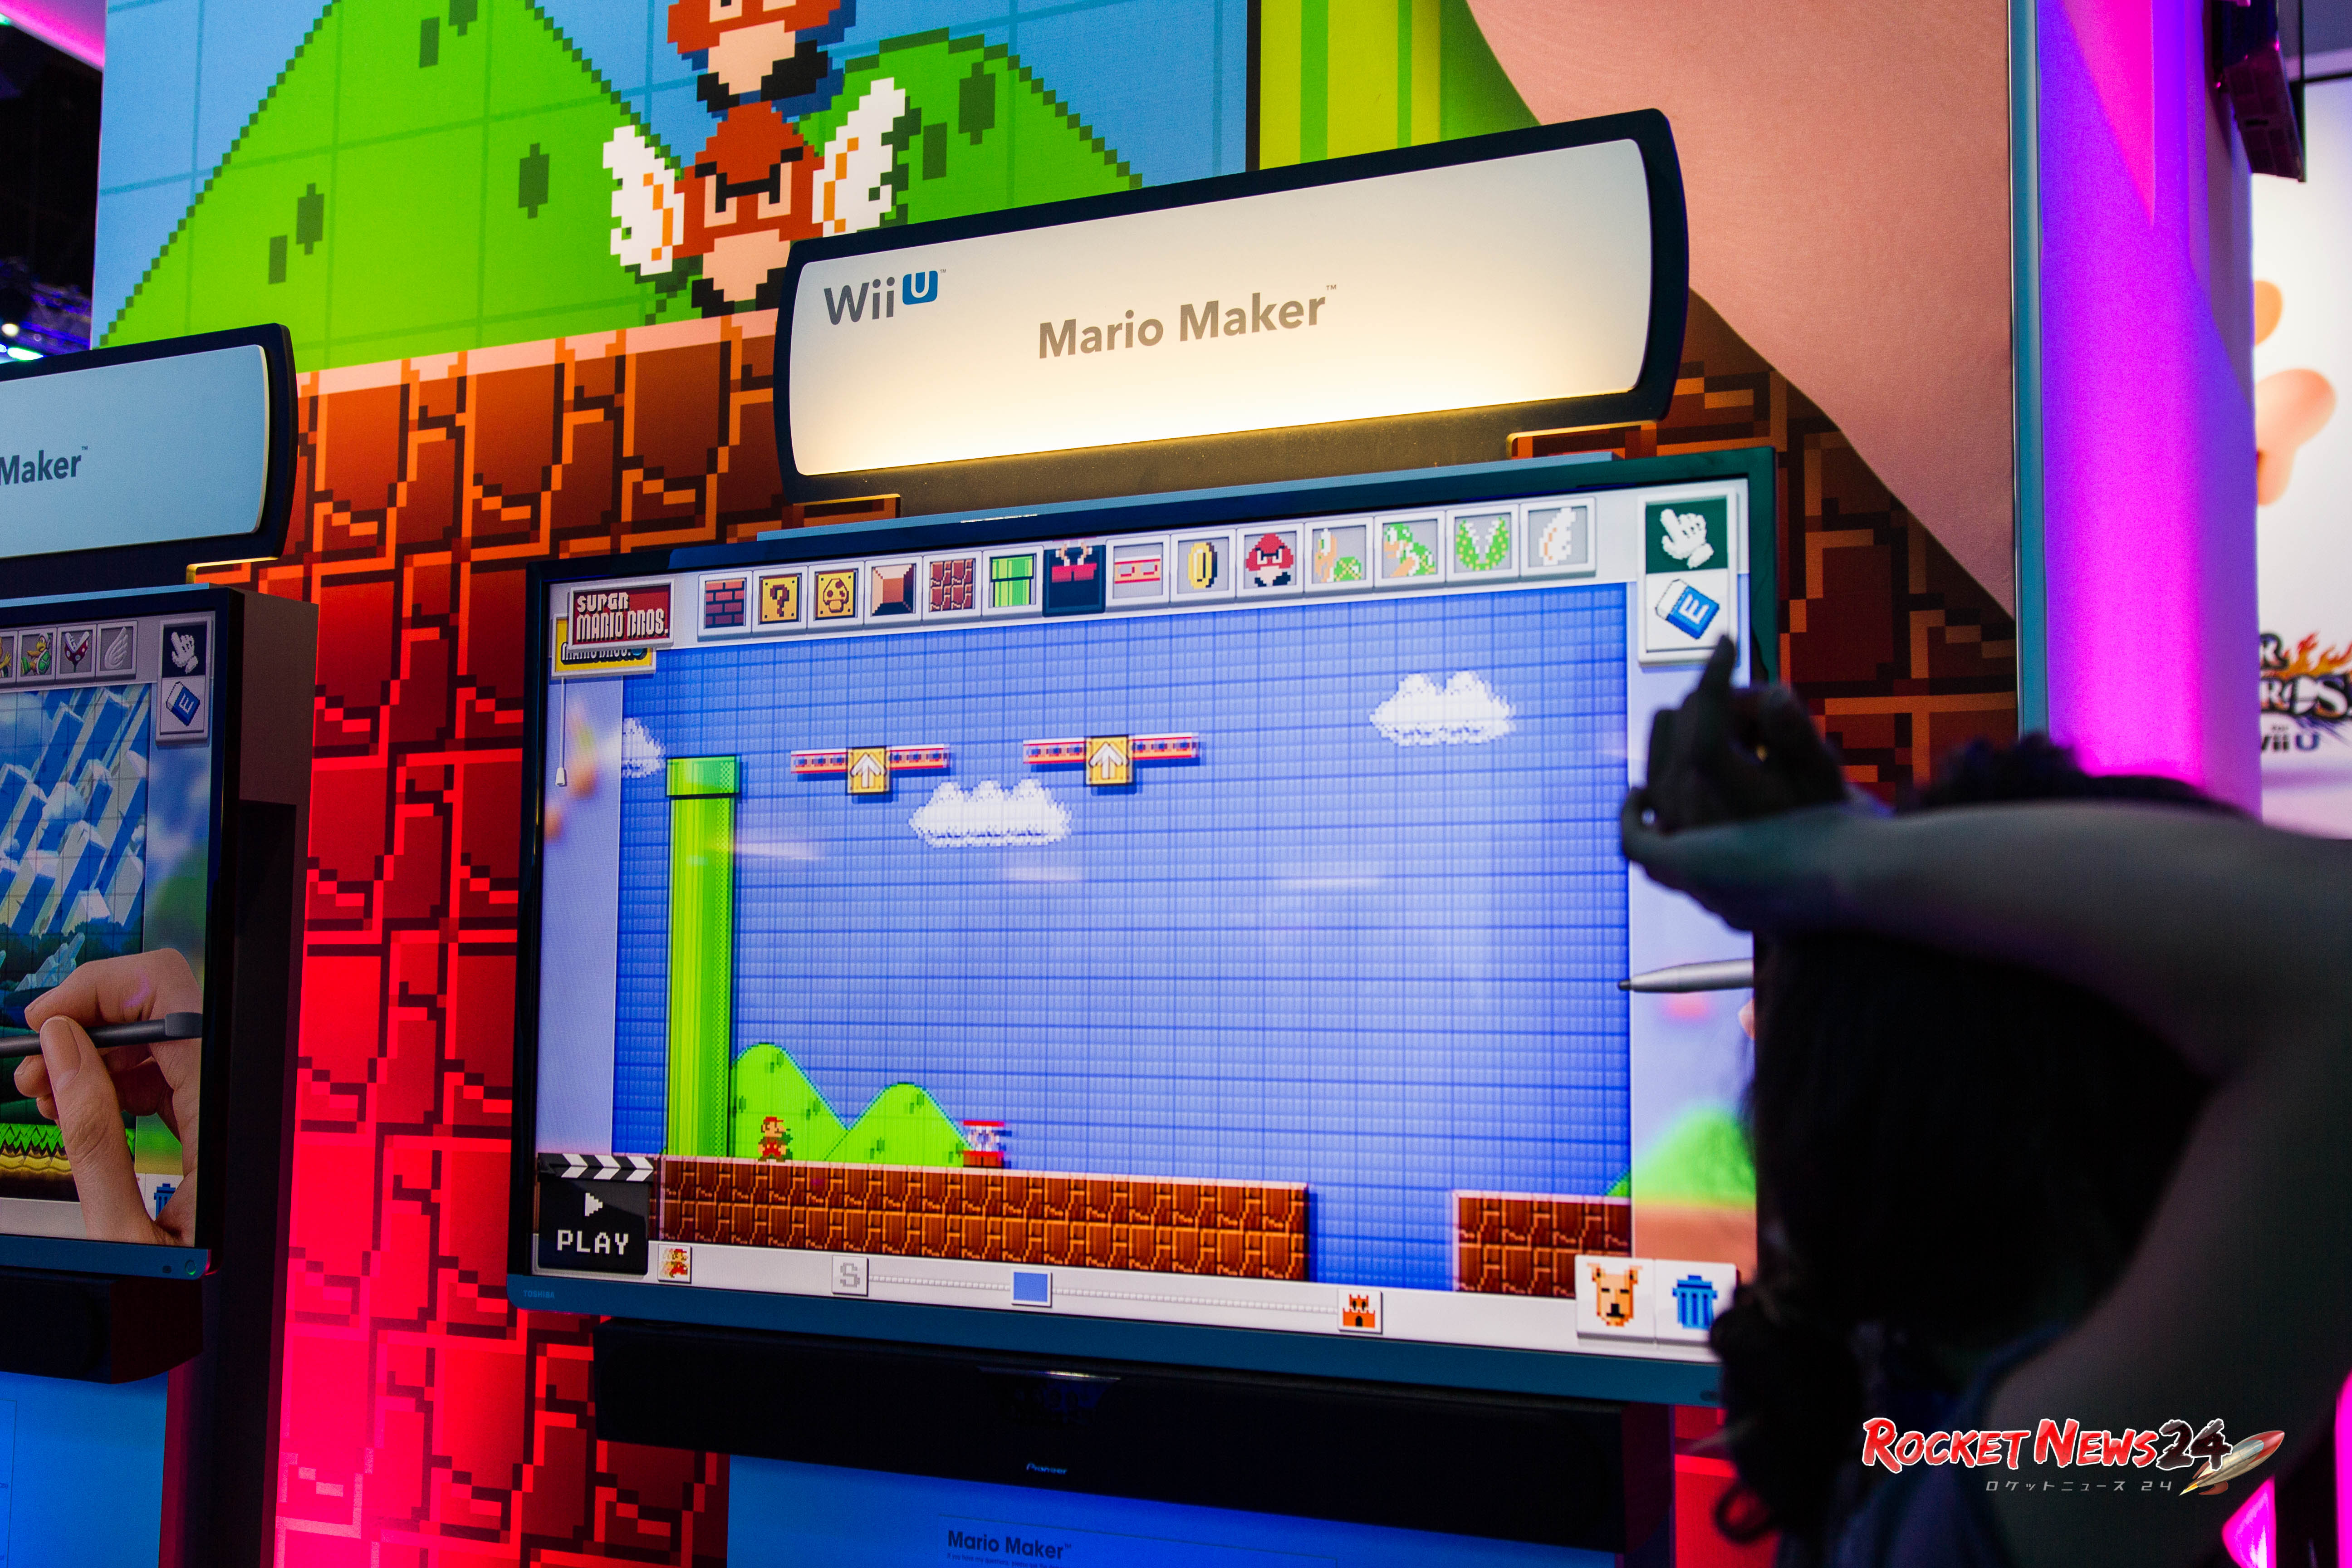 Mario Maker 8